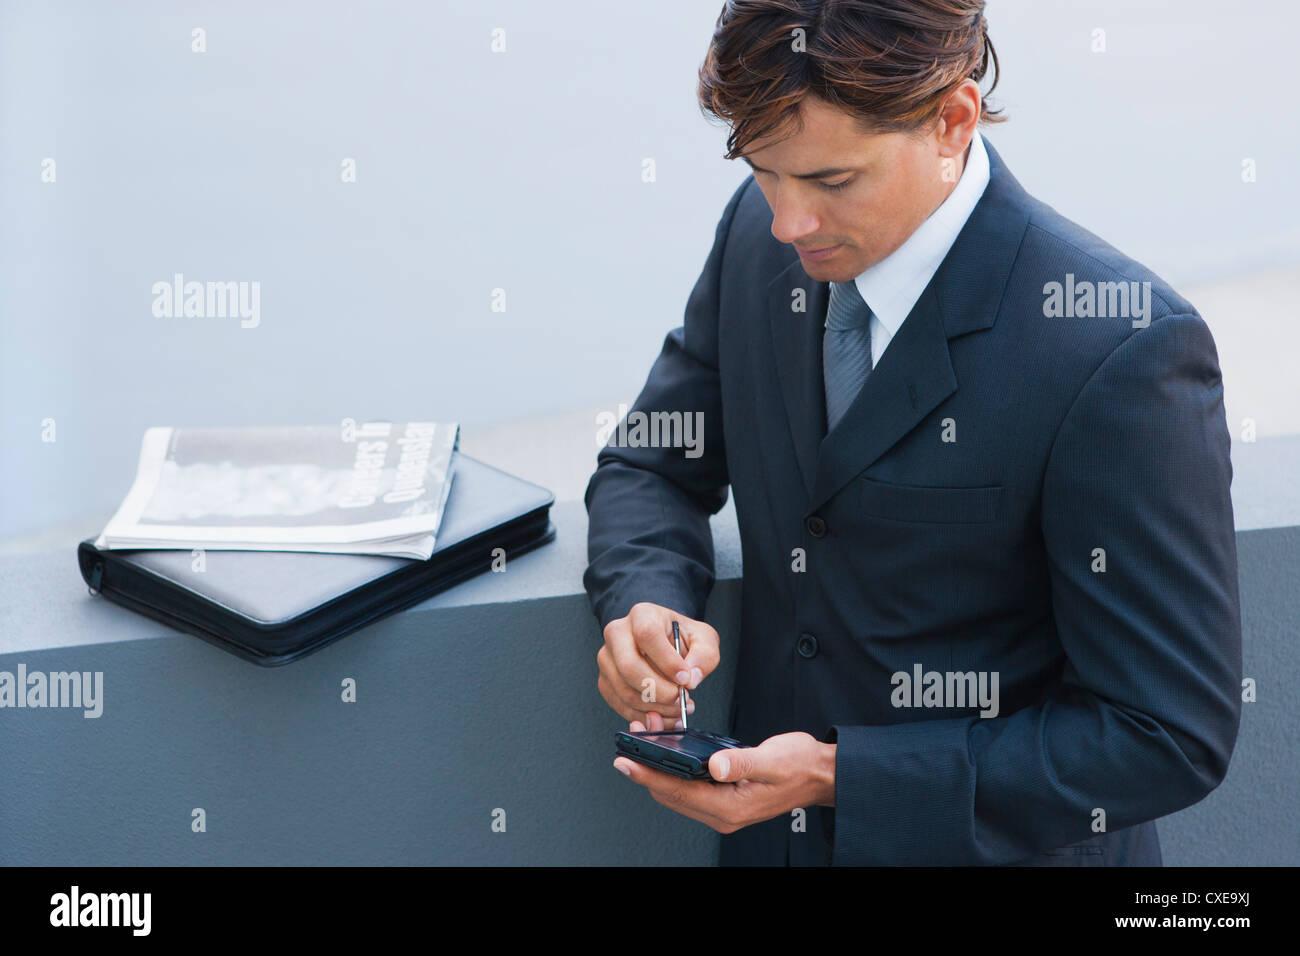 Businessman using PDA - Stock Image